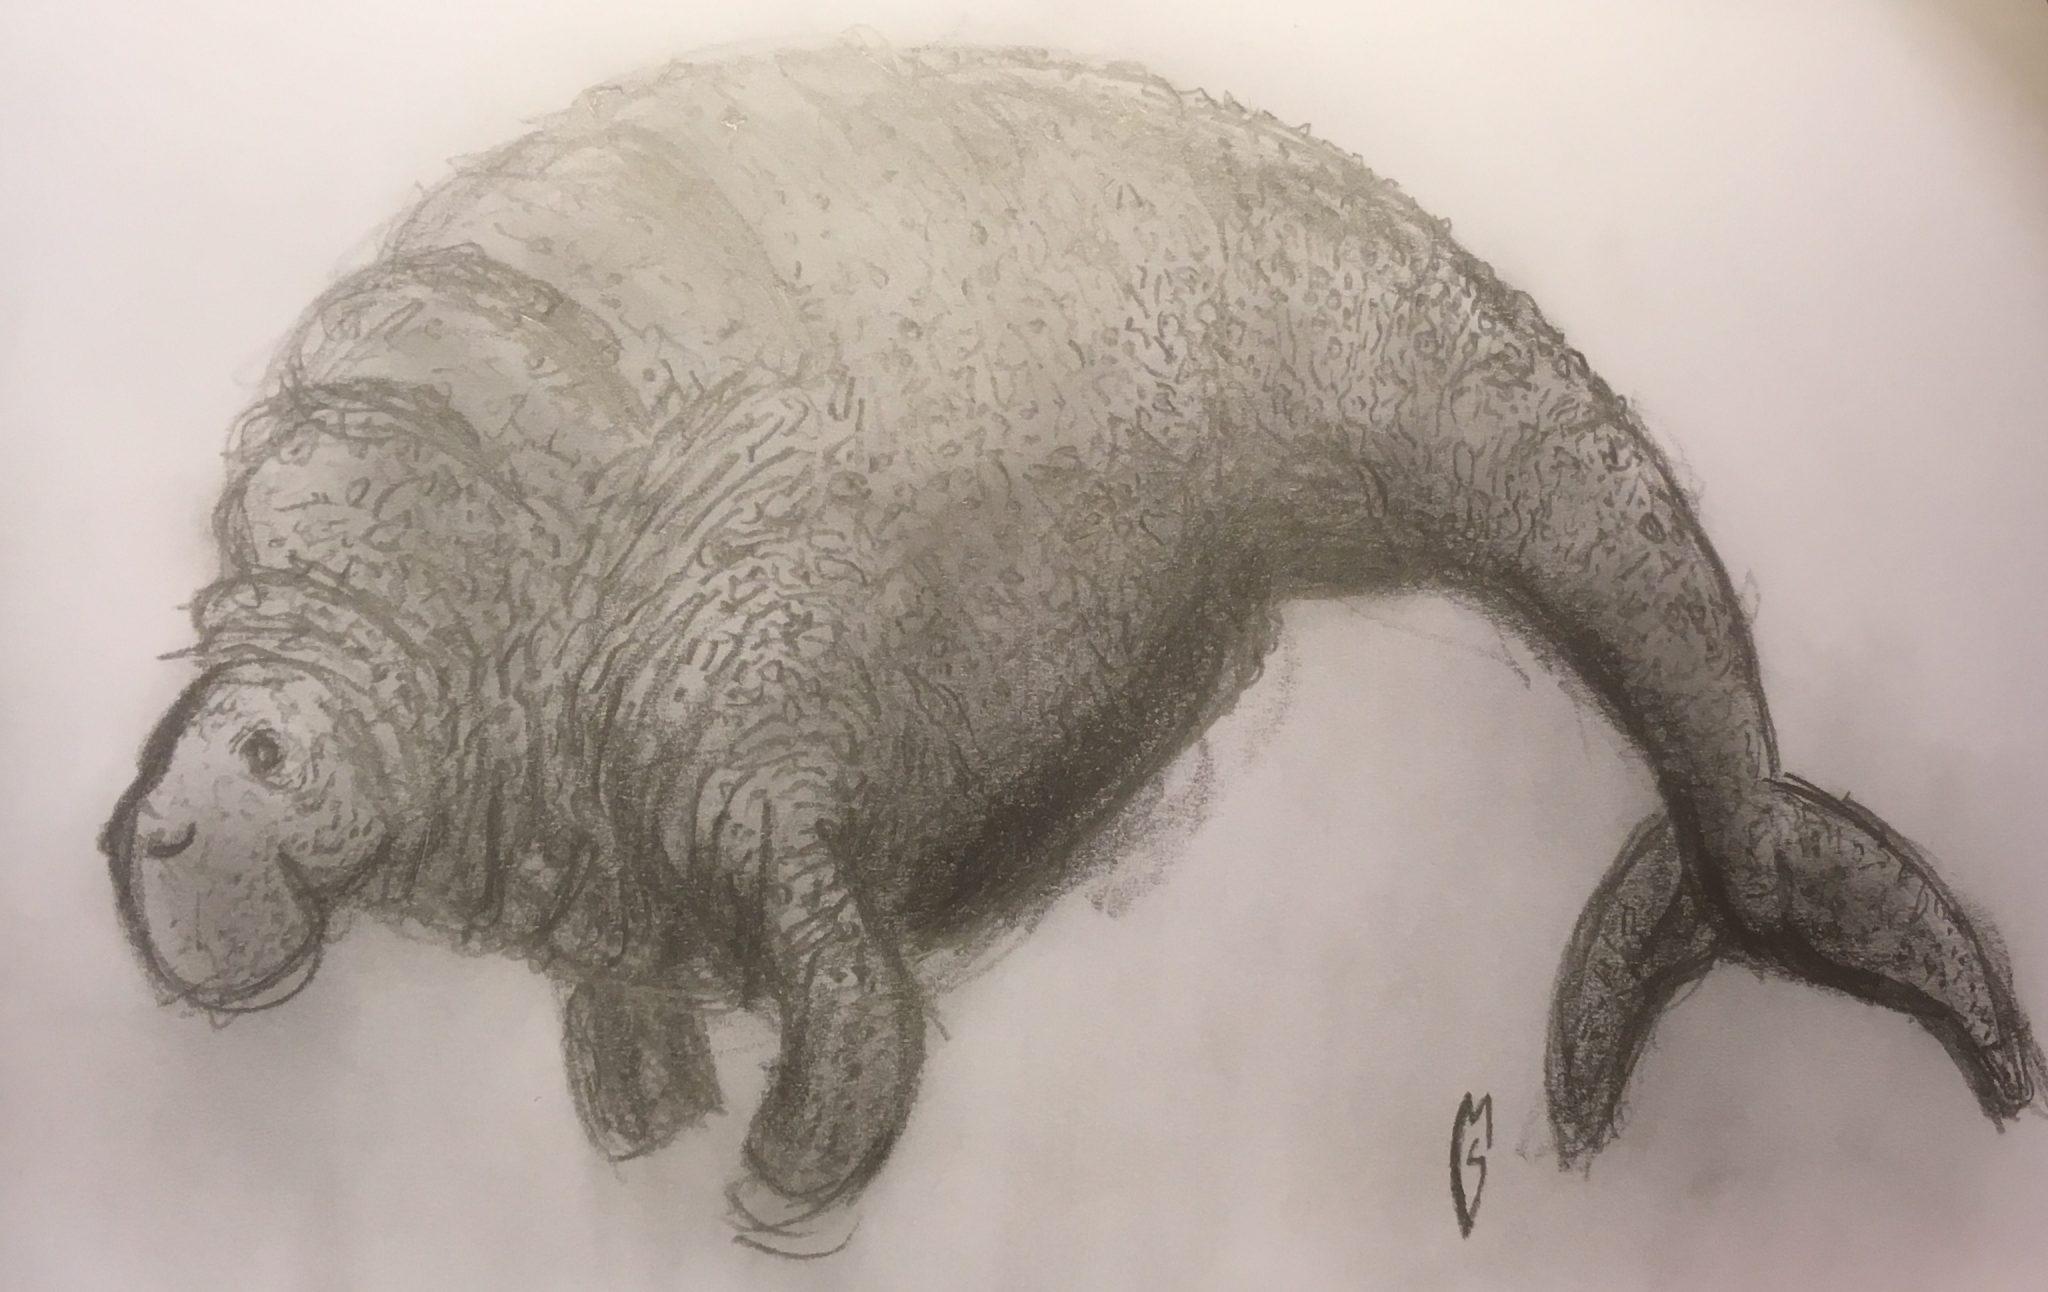 pencil sketch of extinct giant sea cow